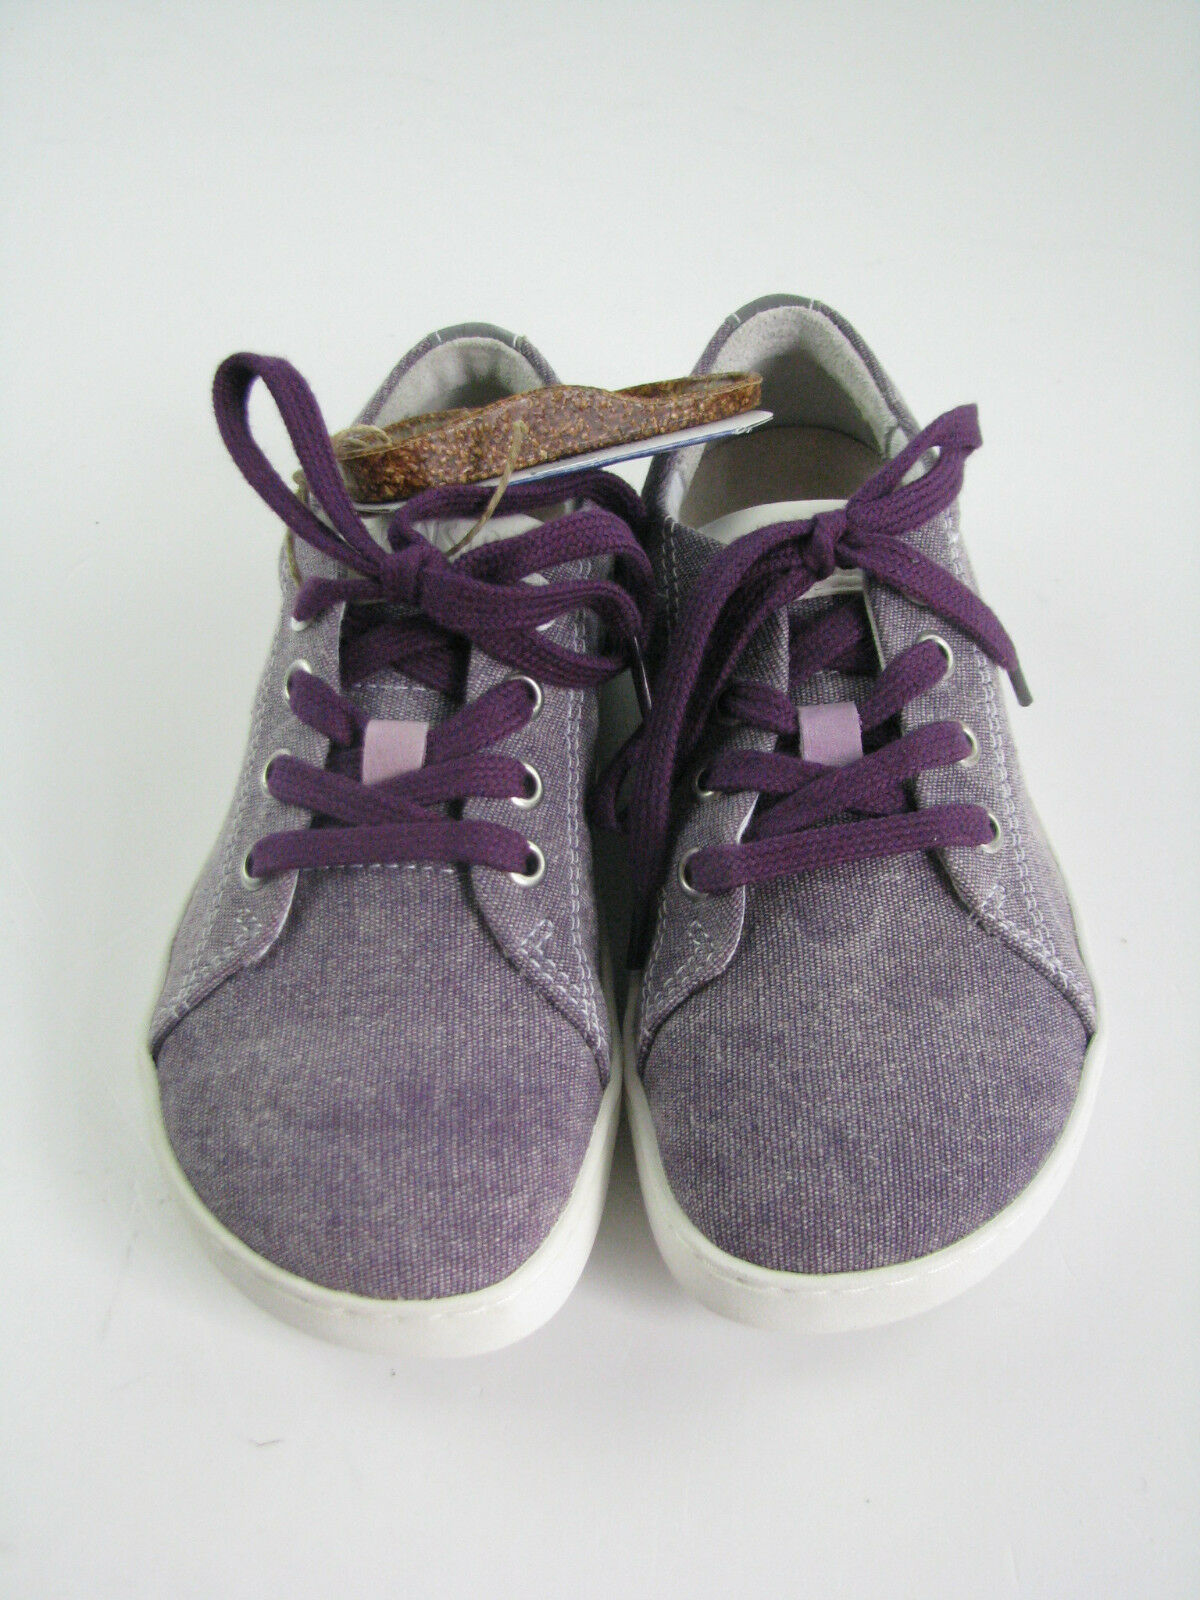 Birkenstock  Kinder Halbschuhe Sneaker , in Lila in Gr.29 , normale Weite